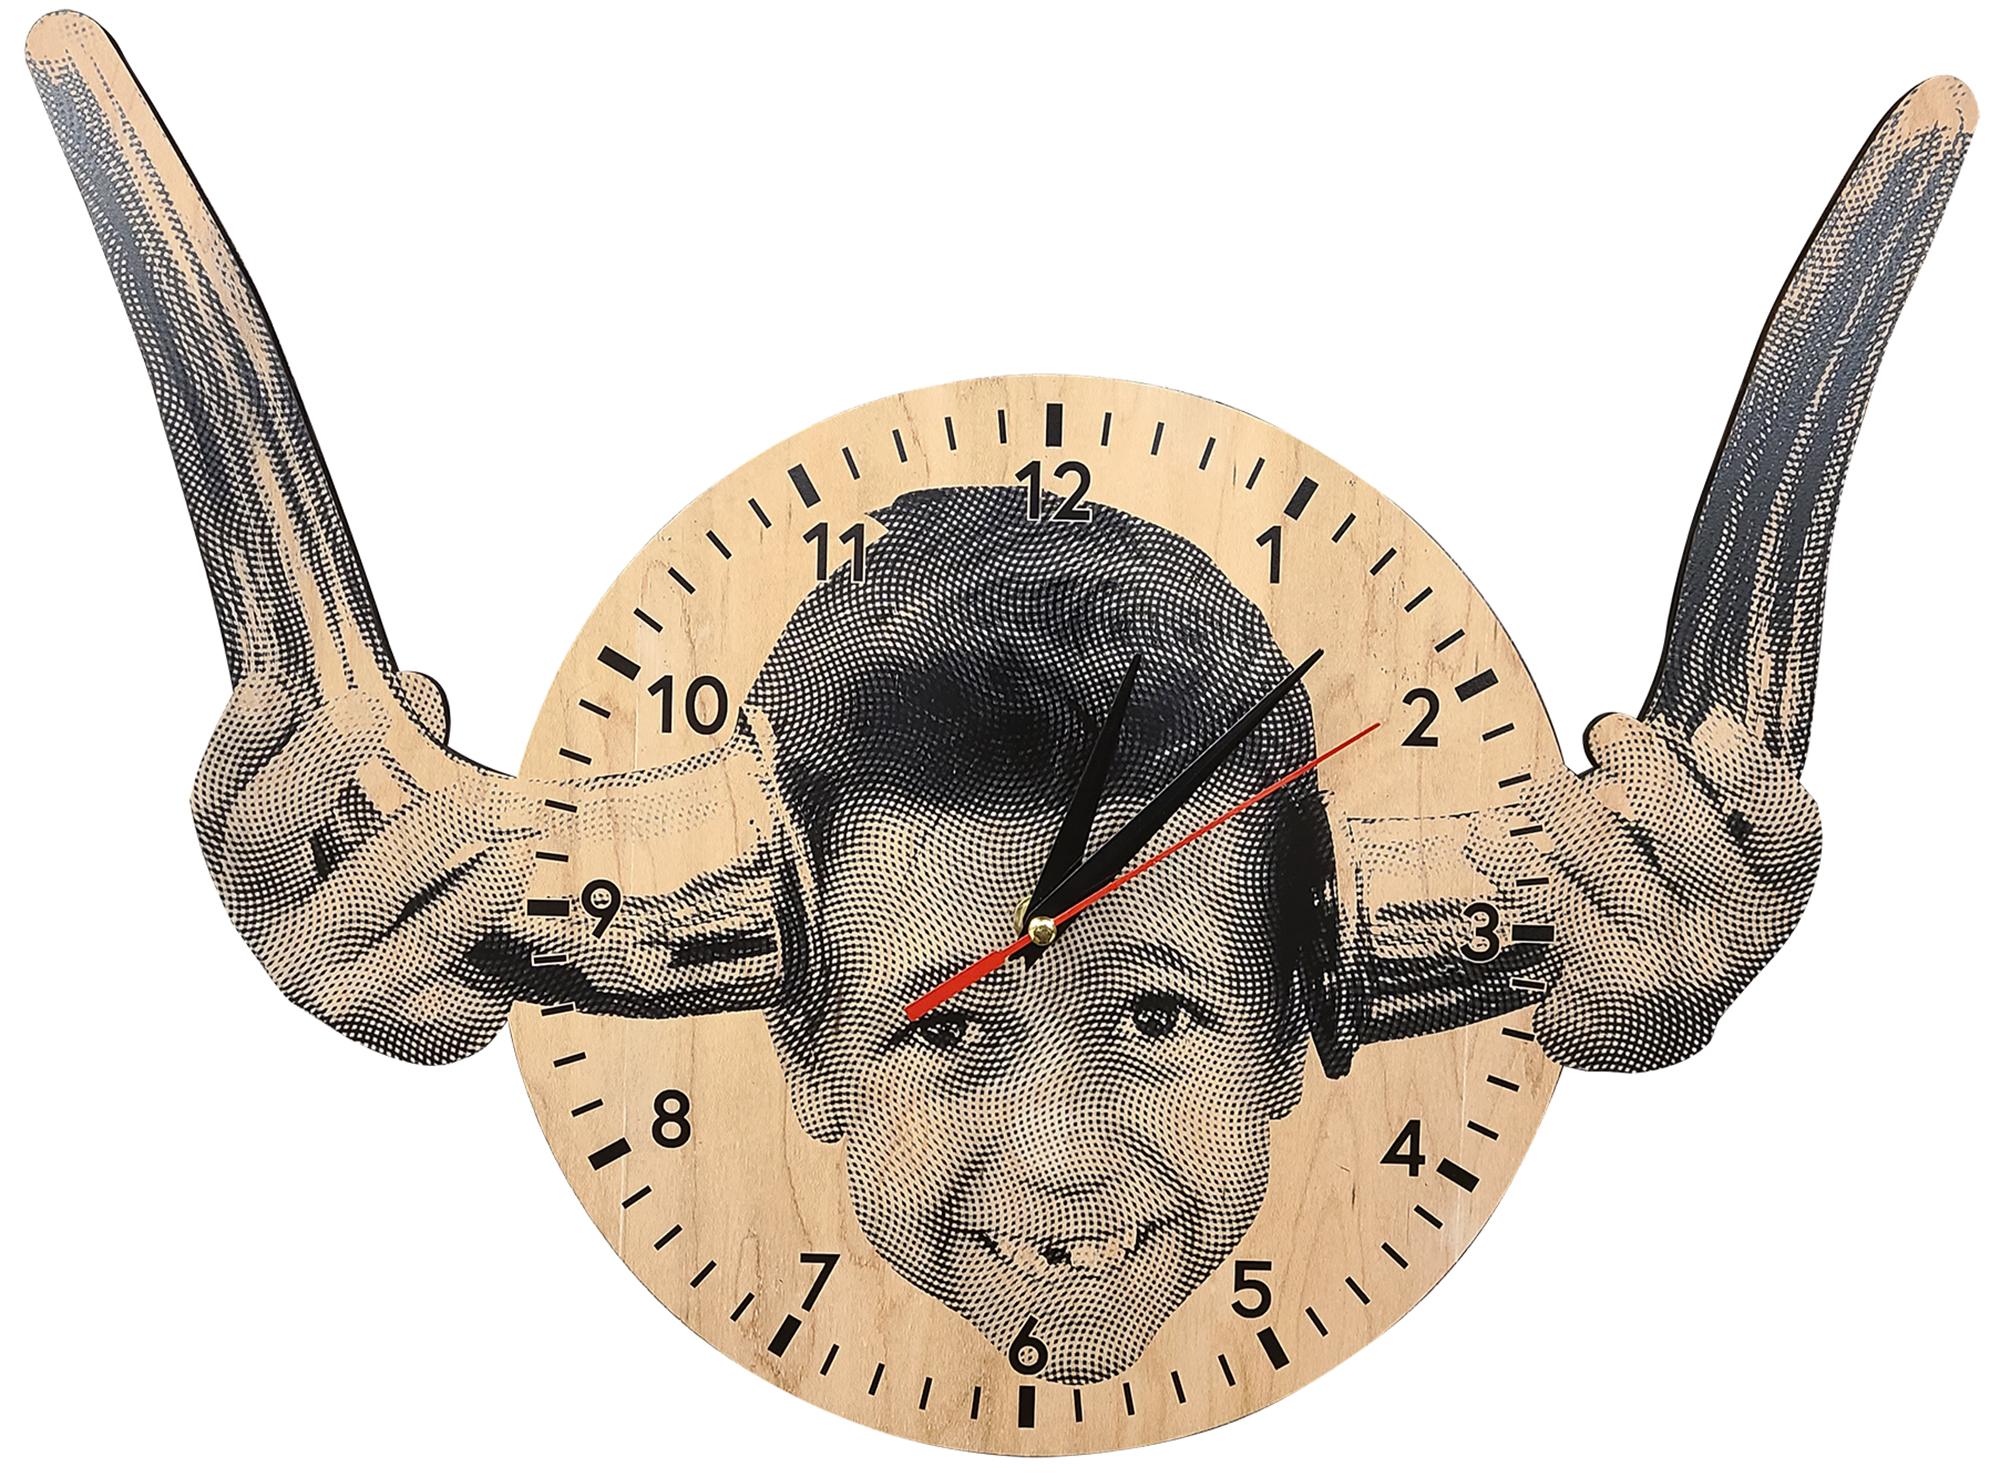 Vinylbomb (Hamilton, NJ), uses their Trotec Speedy 400 laser engraver to create one-of-a-kind custom clocks with photos and logos engraved into them.